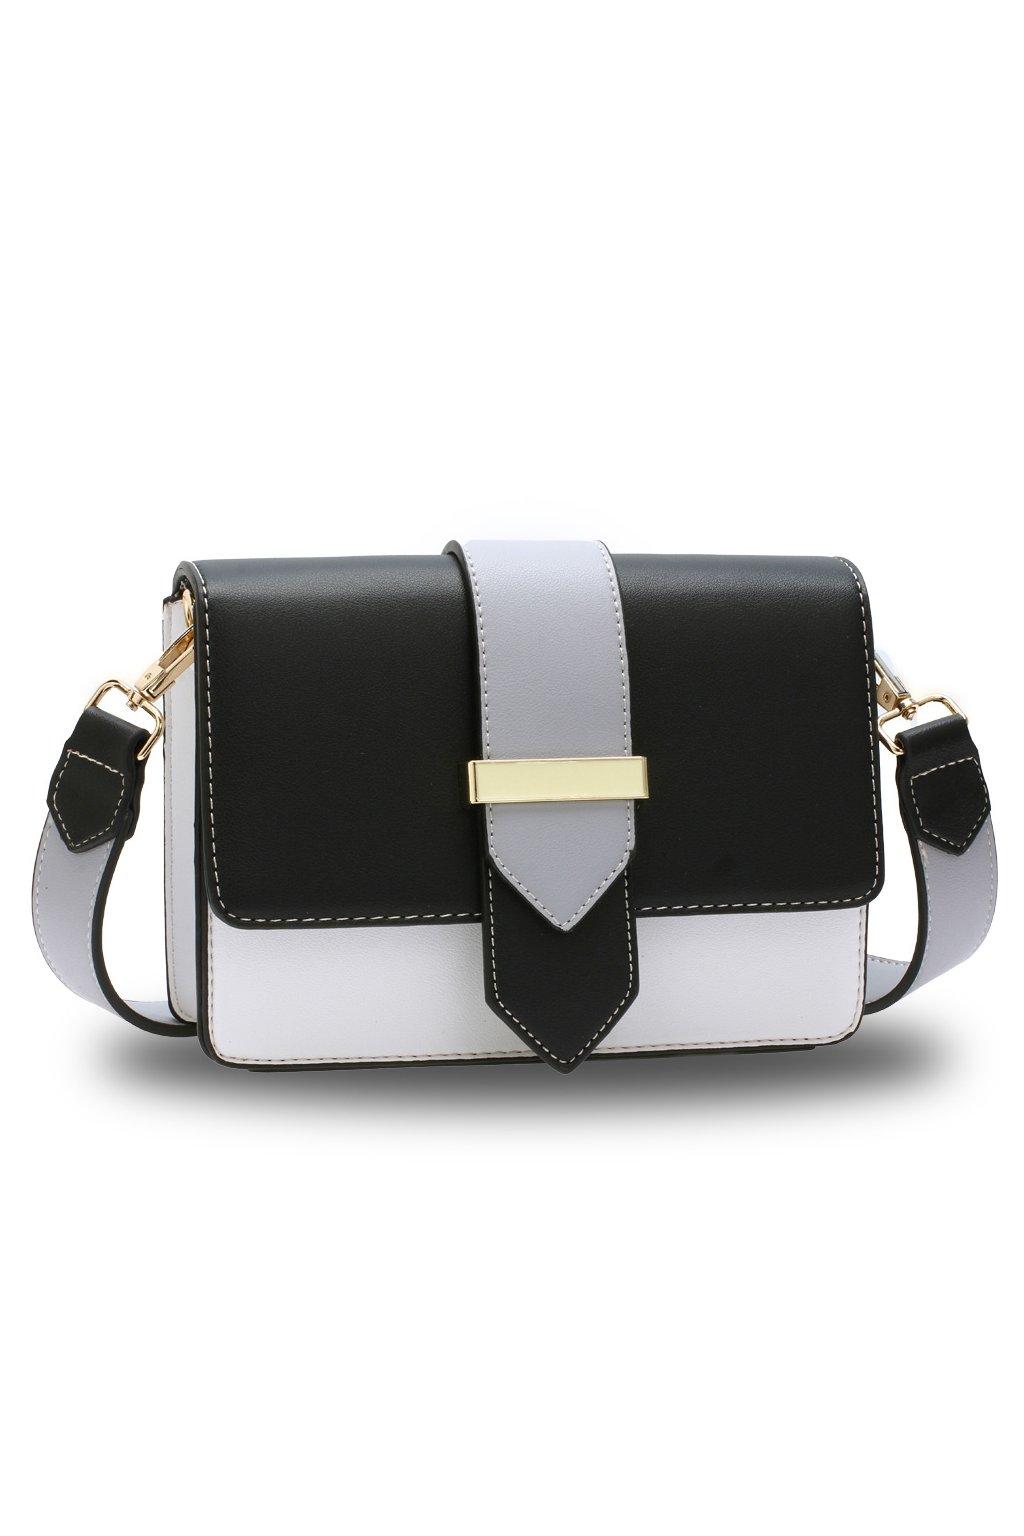 Crossbody kabelka čierna / biela / sivá Kaylee AG00692